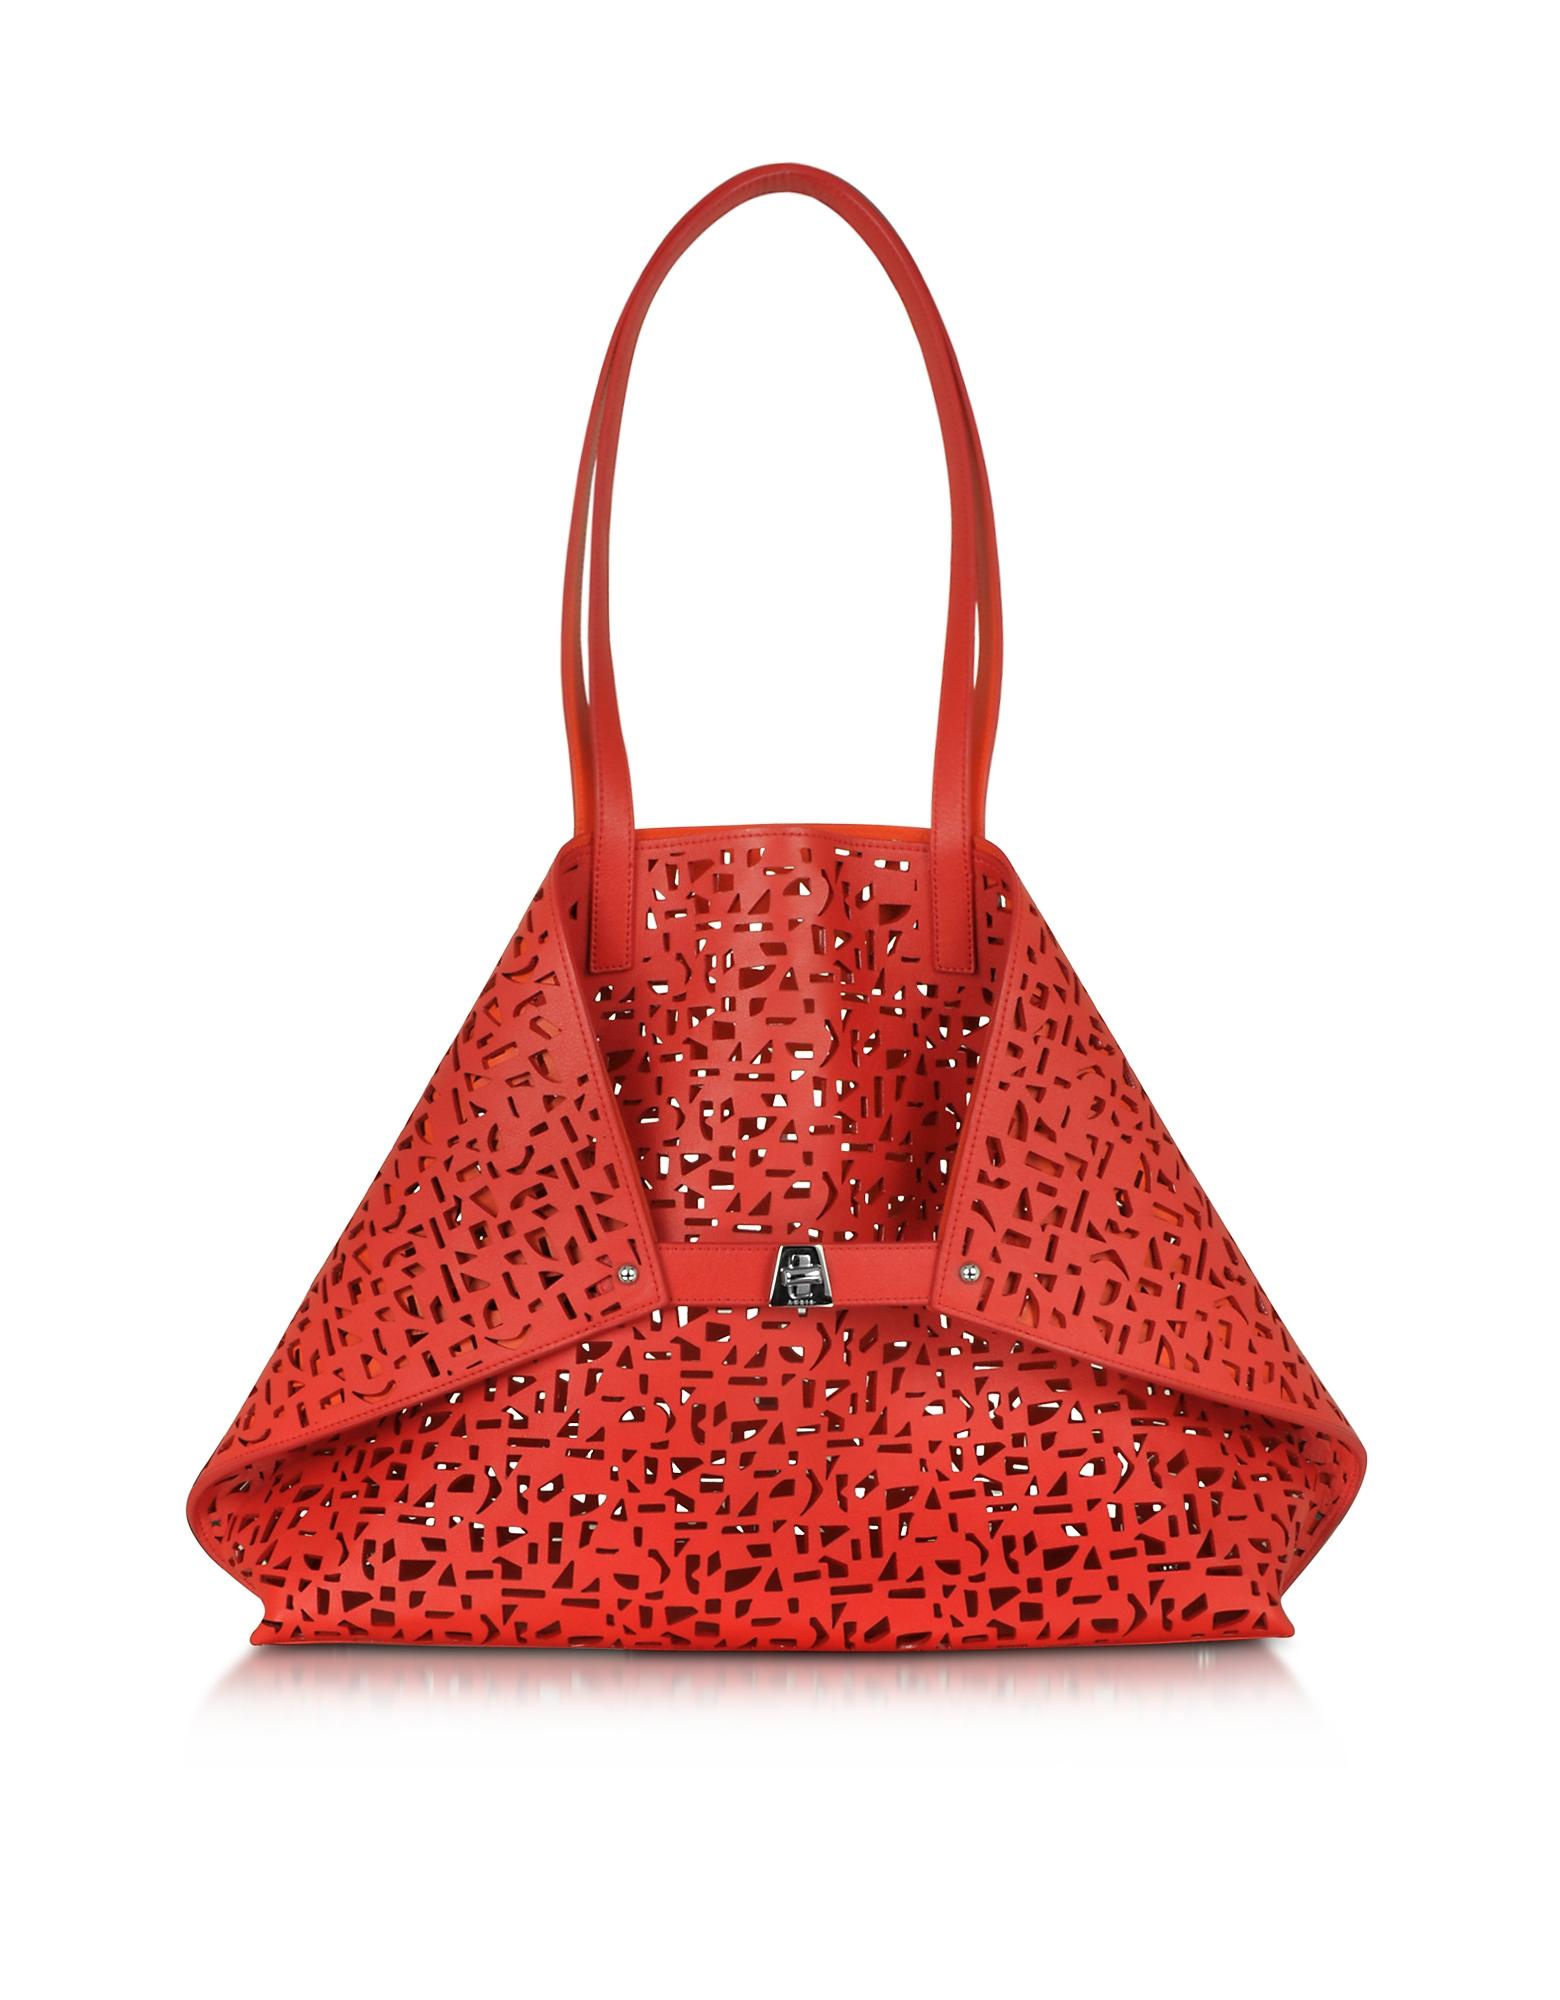 Image of Ai Medium Shopper Scarlet/Zinnia Cut Out